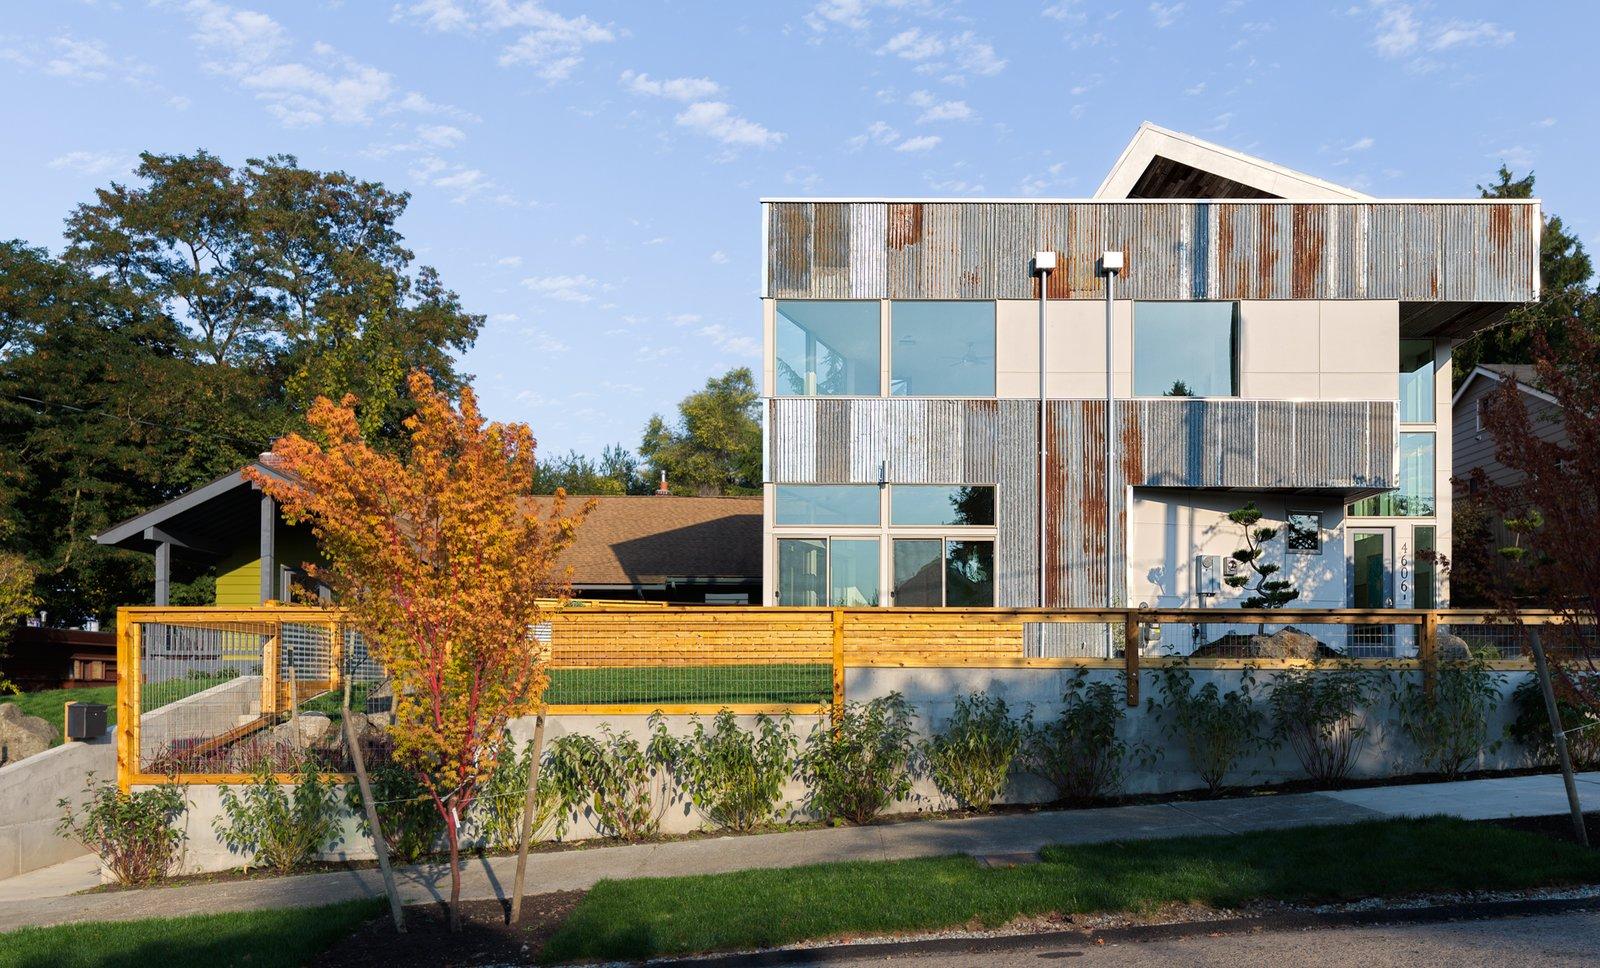 Net Zero Concept & Designs from Architecture Spotlight #50 | Reclaimed Modern by Dwell Development | Seattle, WA